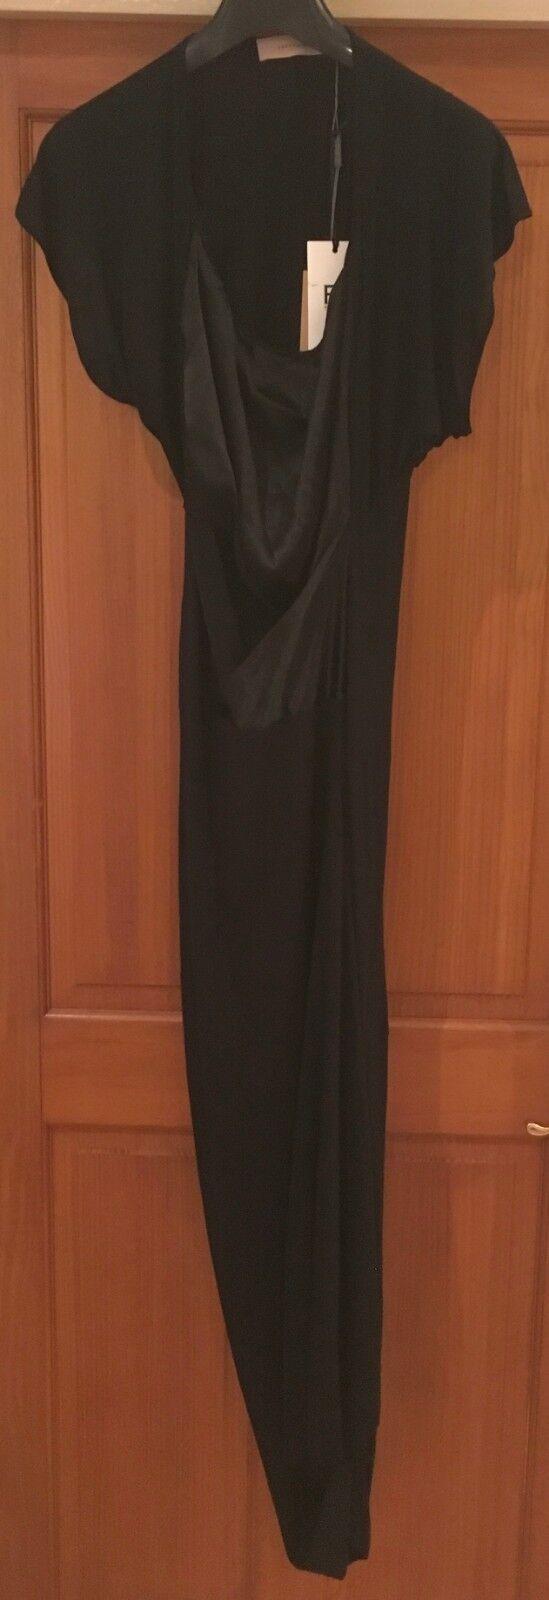 PREEN LINE Long schwarz 'Serpant' Silk Viscose Dress Größe S BNWT NEW